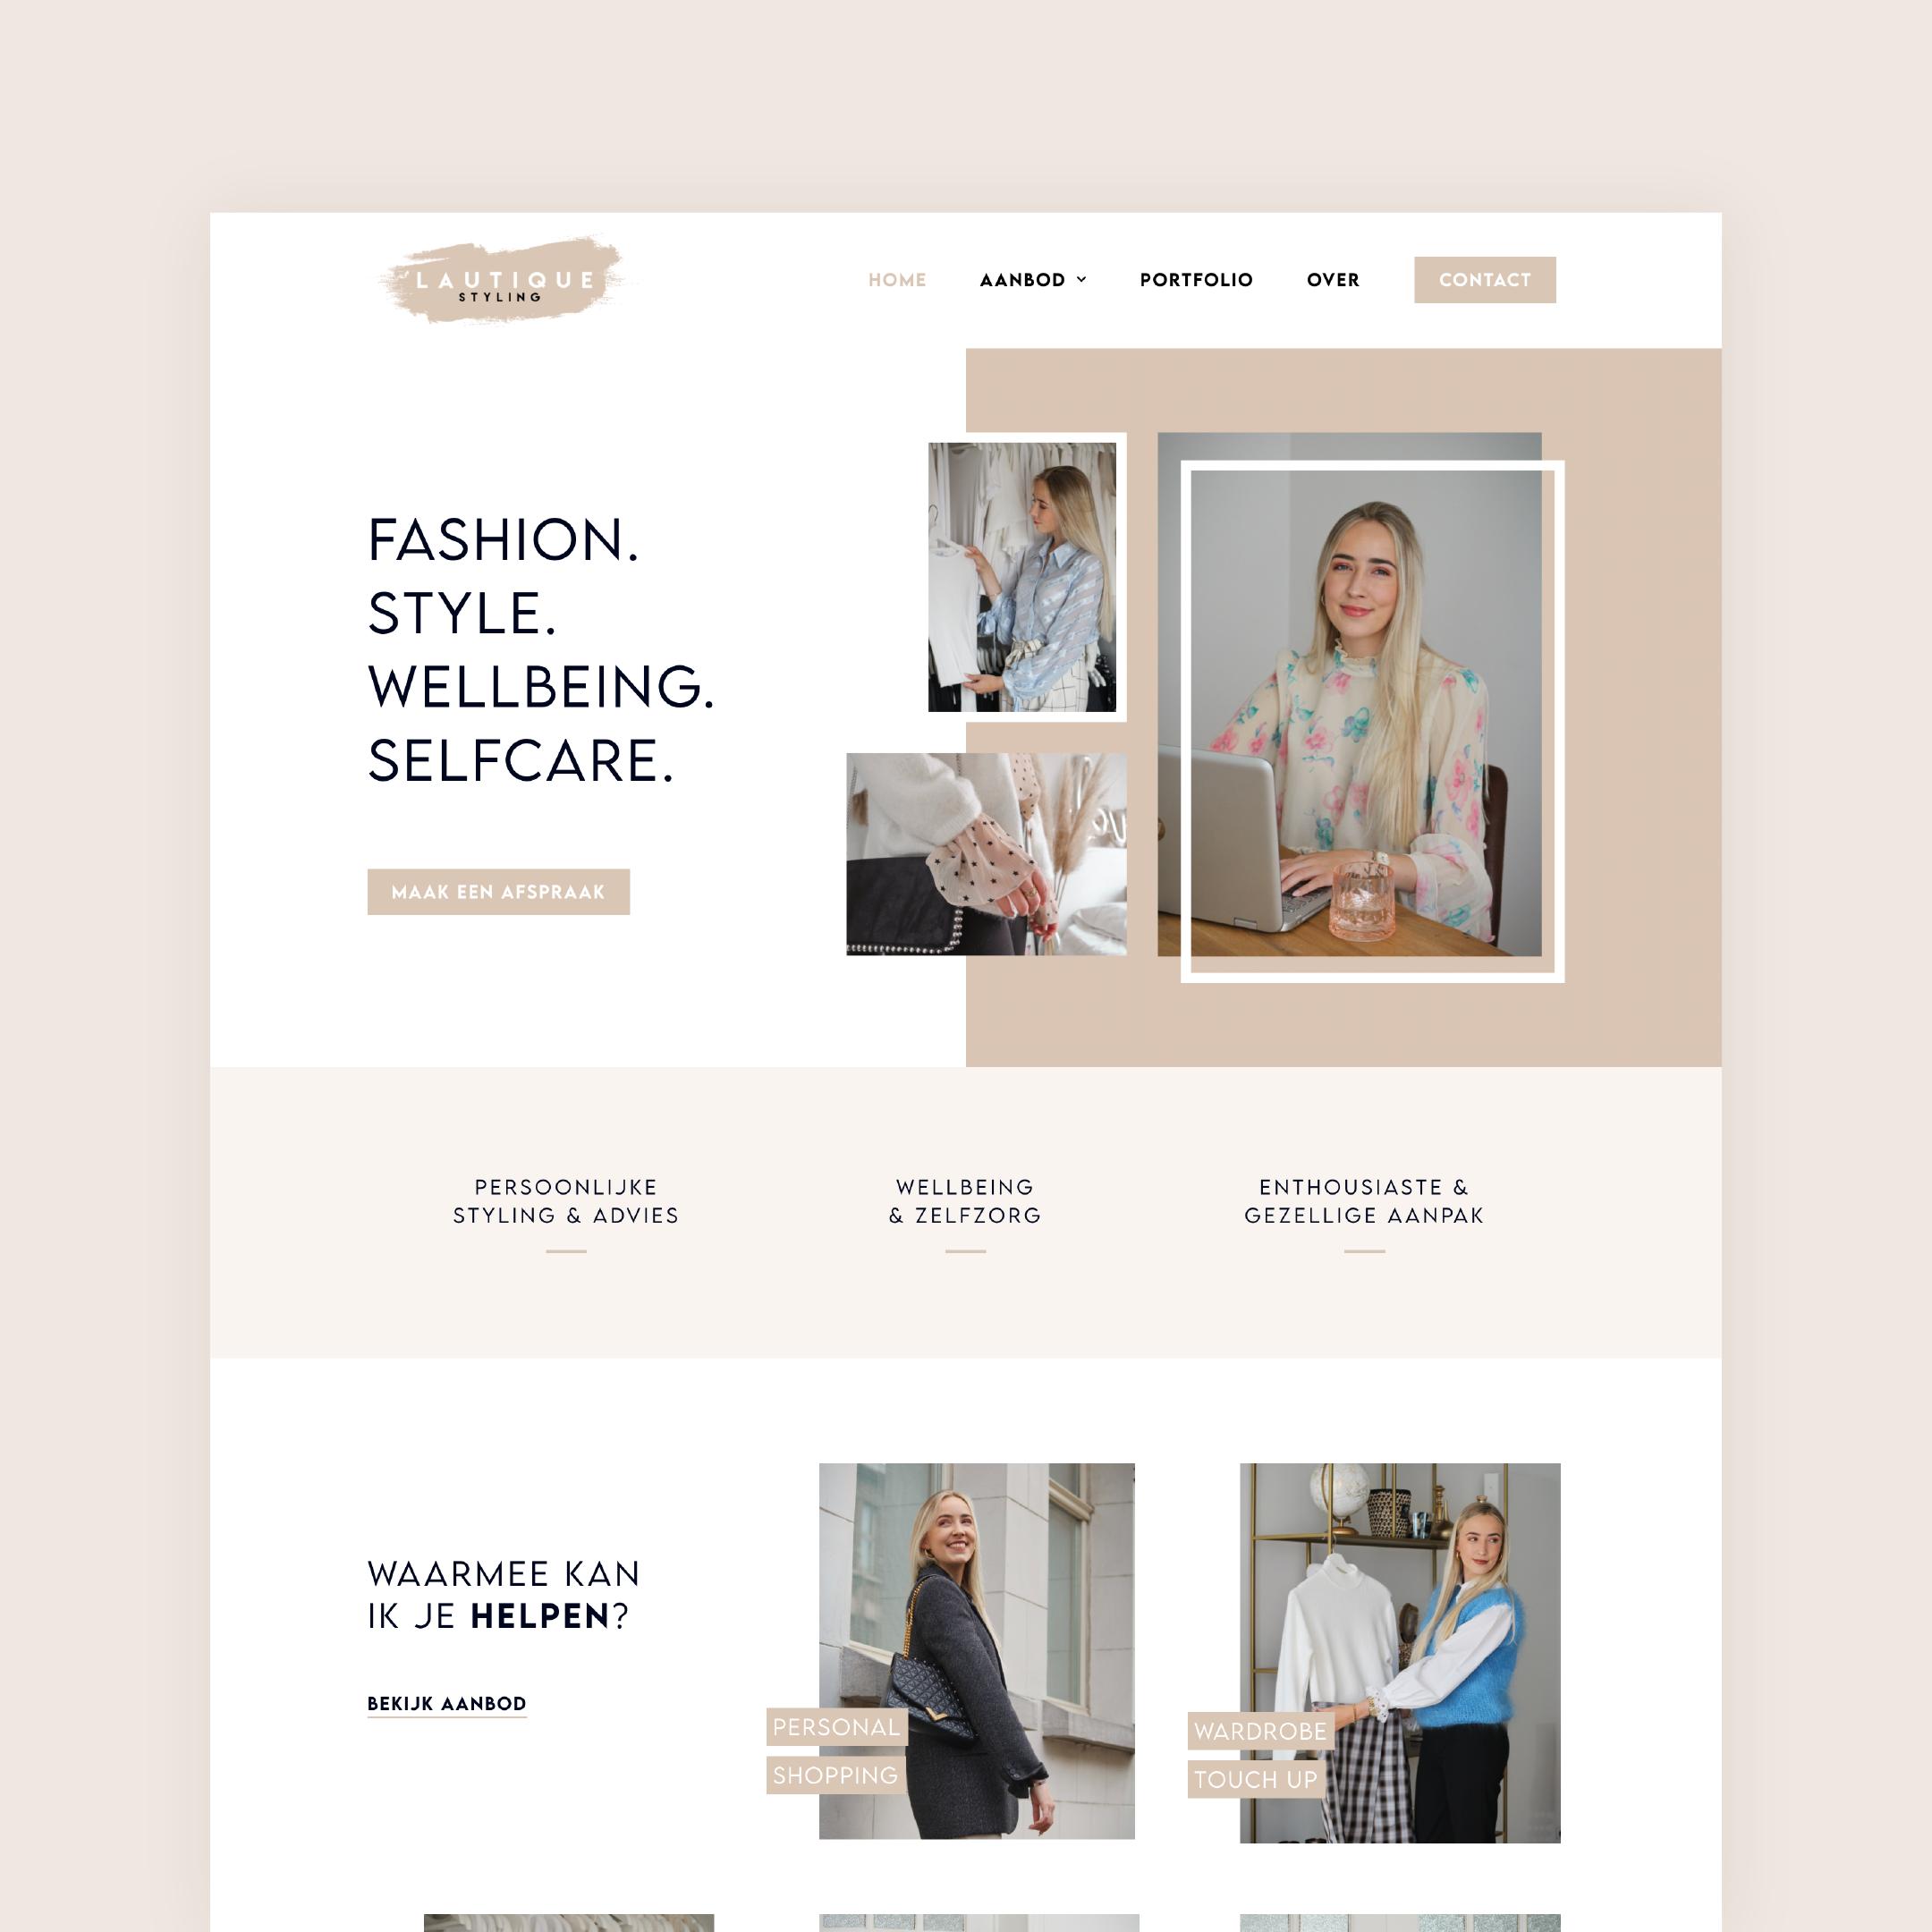 Lautique Styling website